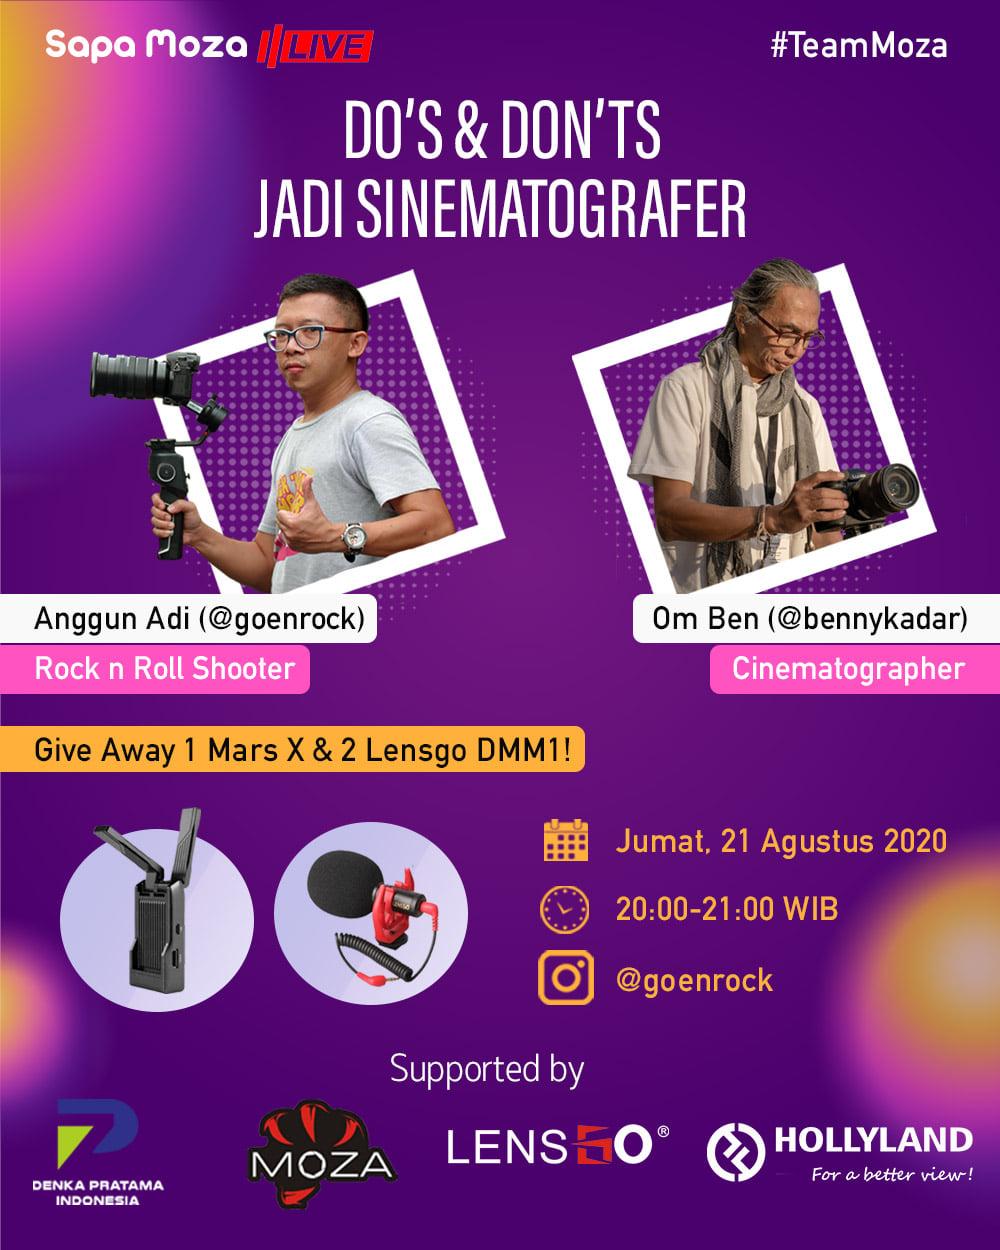 Do's and Don'ts Jadi Sinematografer